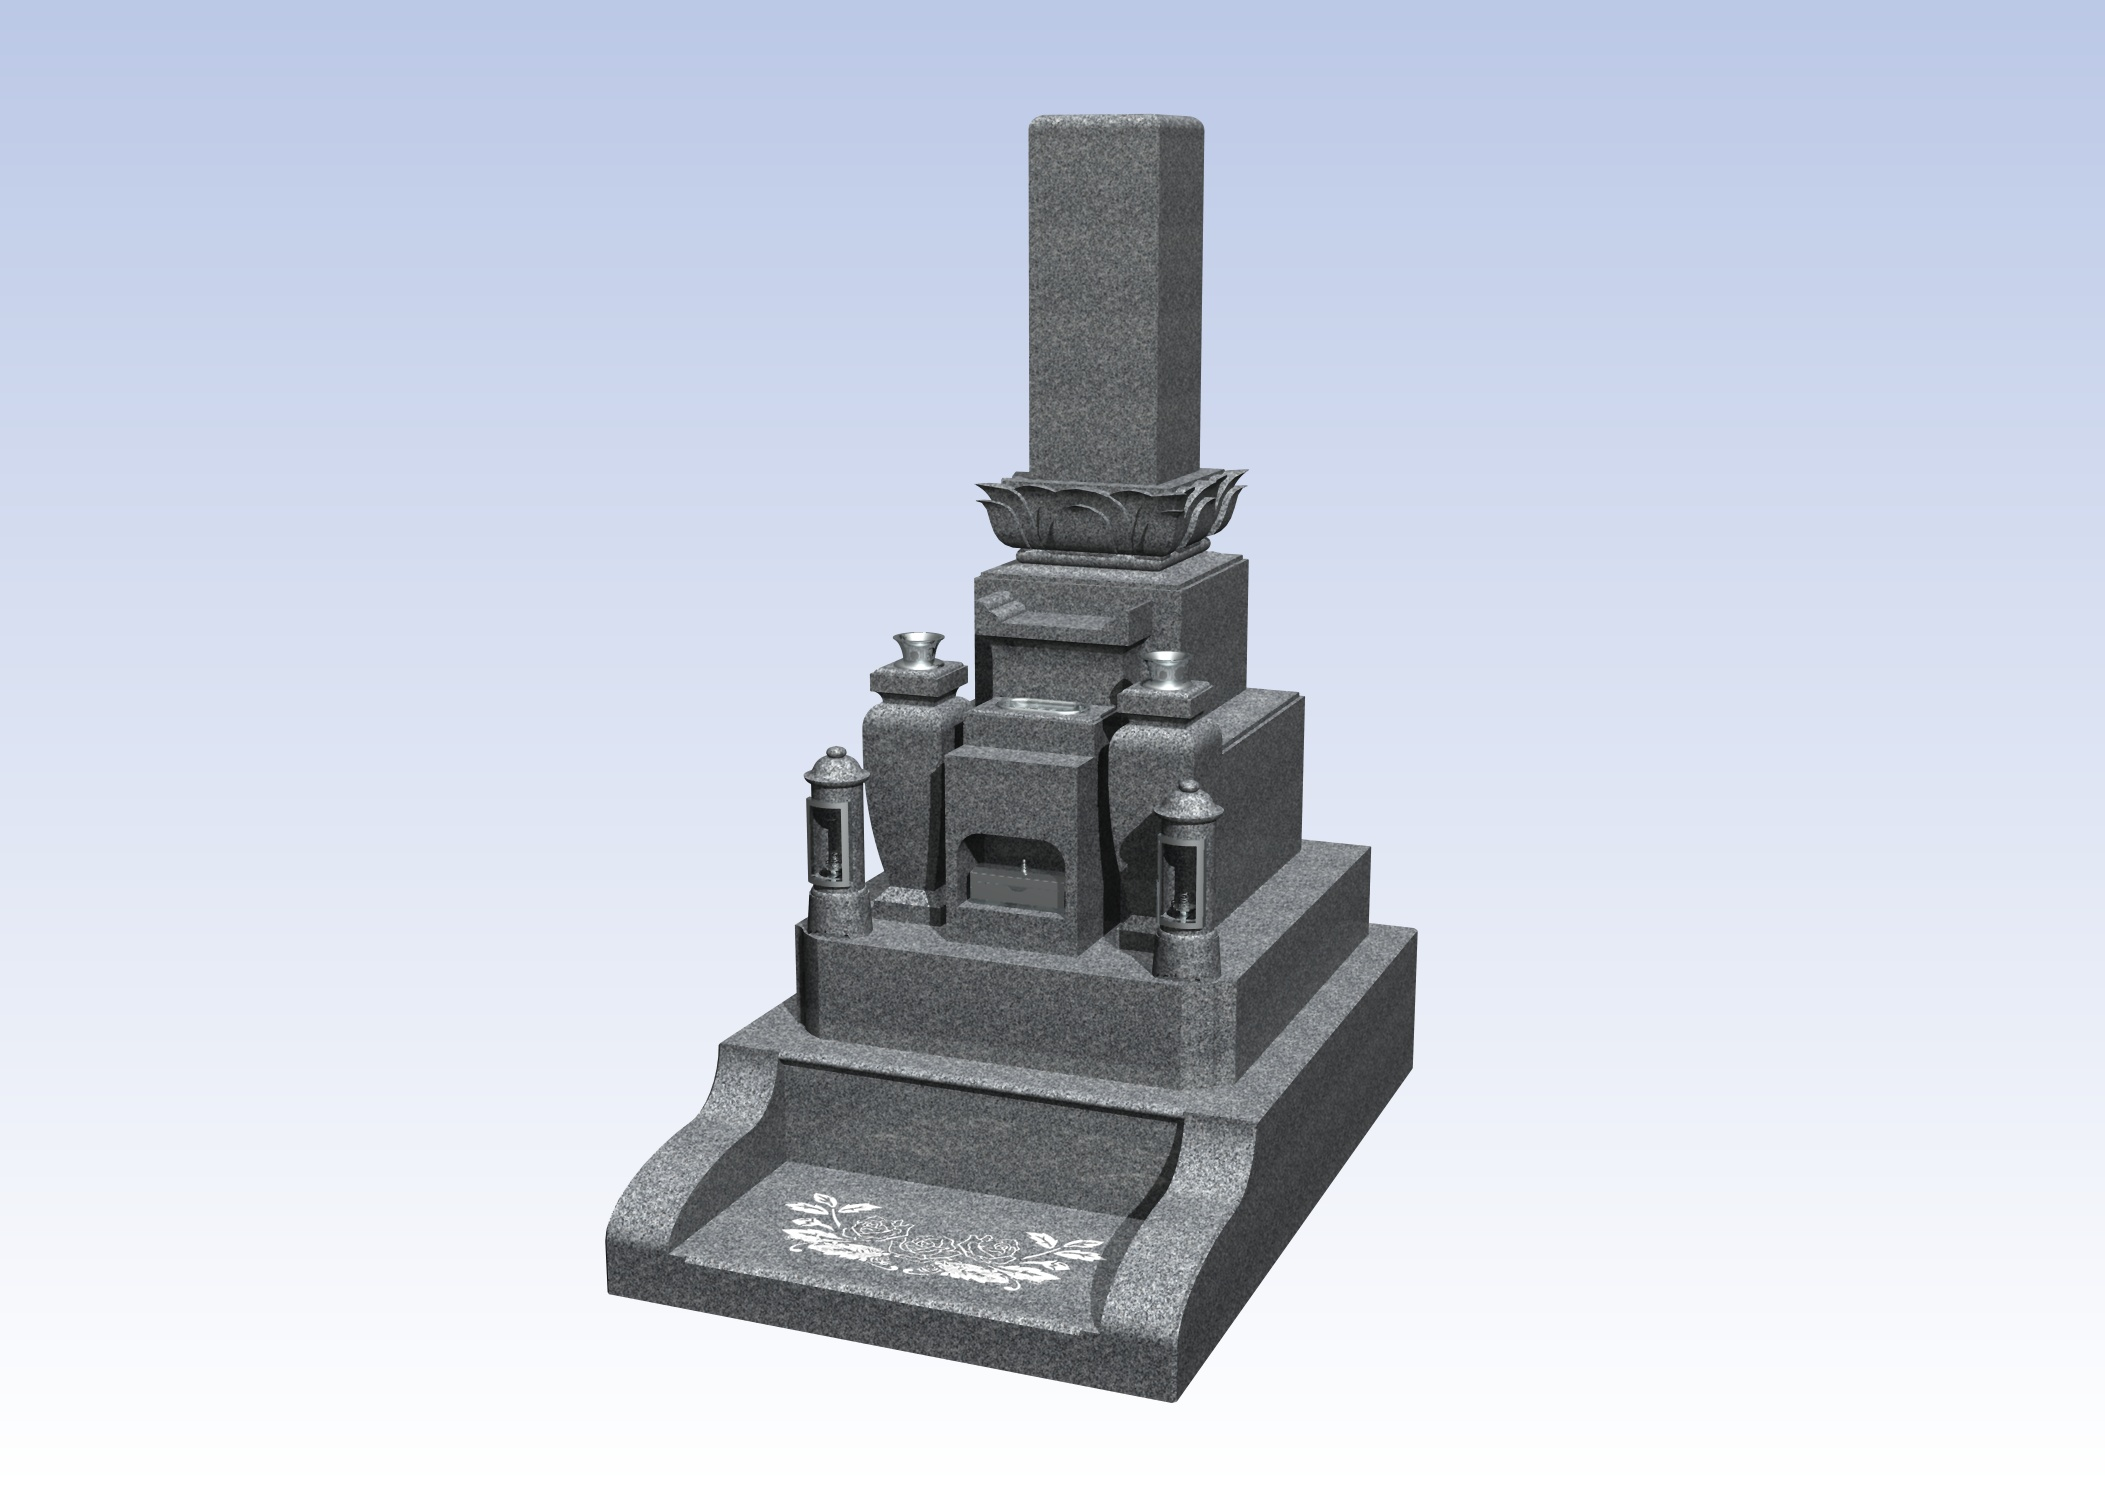 施工例3㎡未満1-8 和泉市 信太山墓地のAfter画像